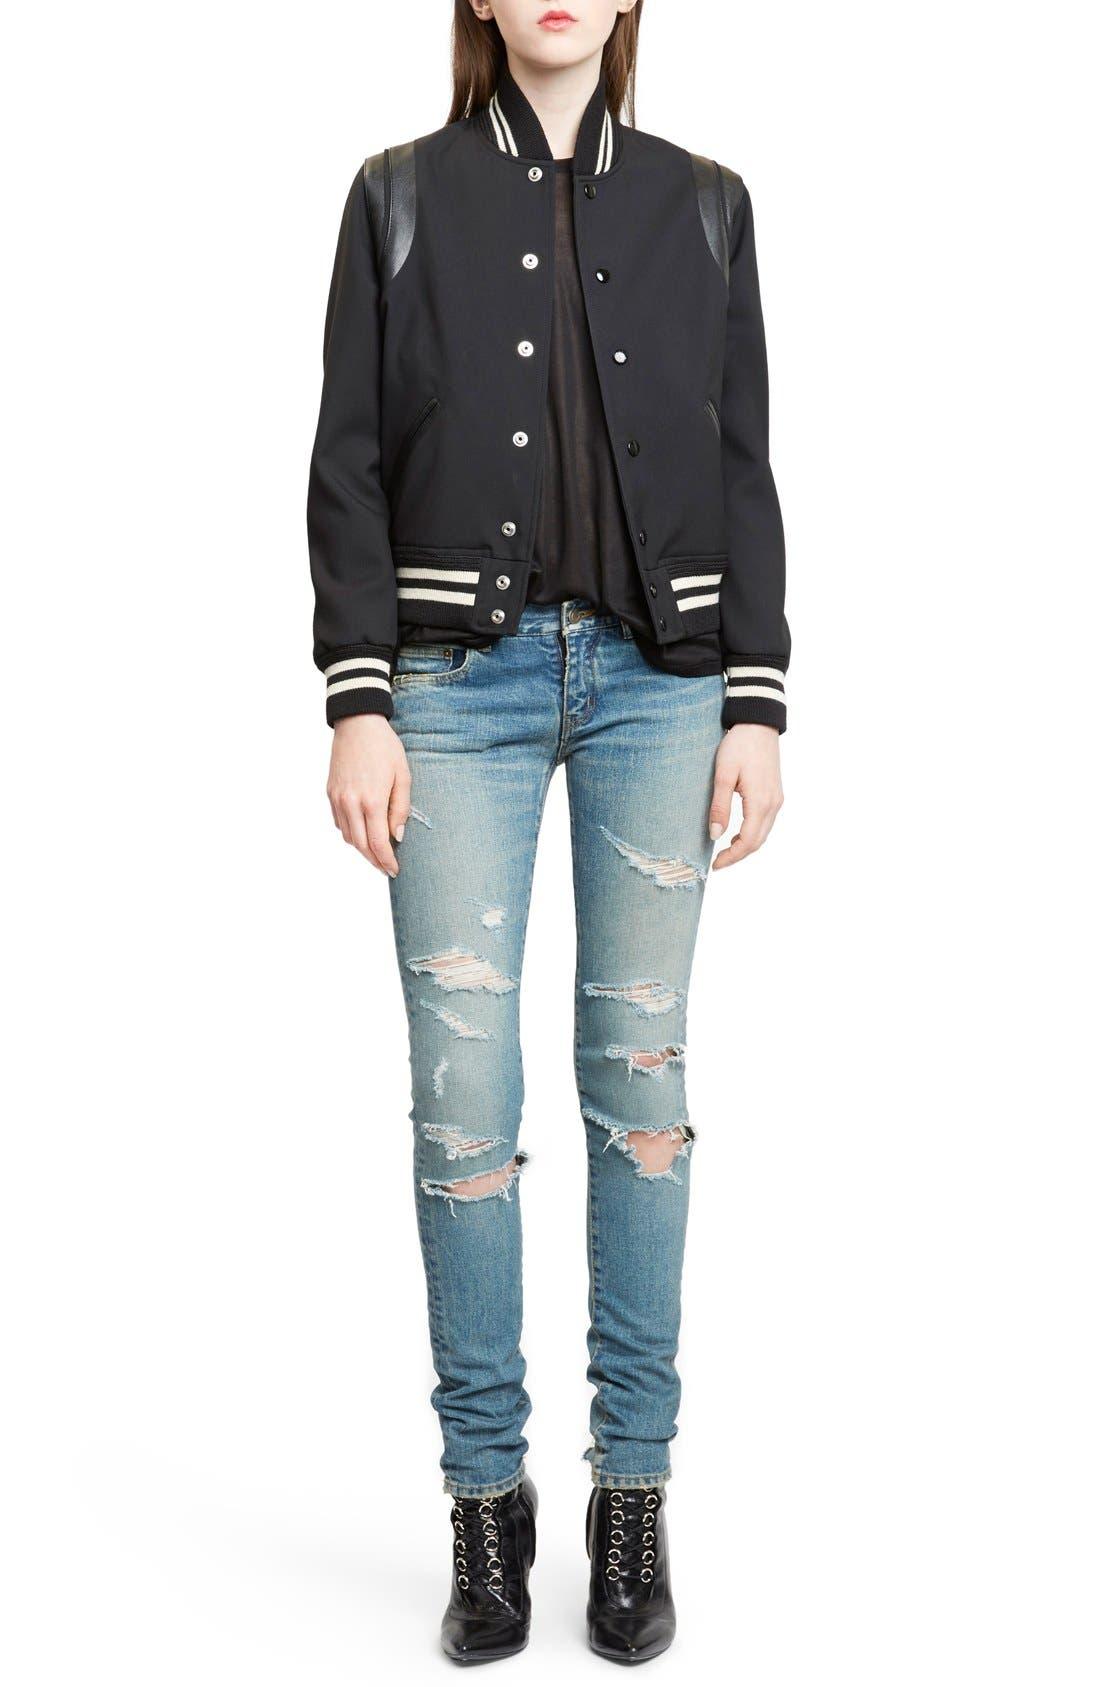 Alternate Image 1 Selected - Saint Laurent 'Teddy' Black Leather Trim Bomber Jacket